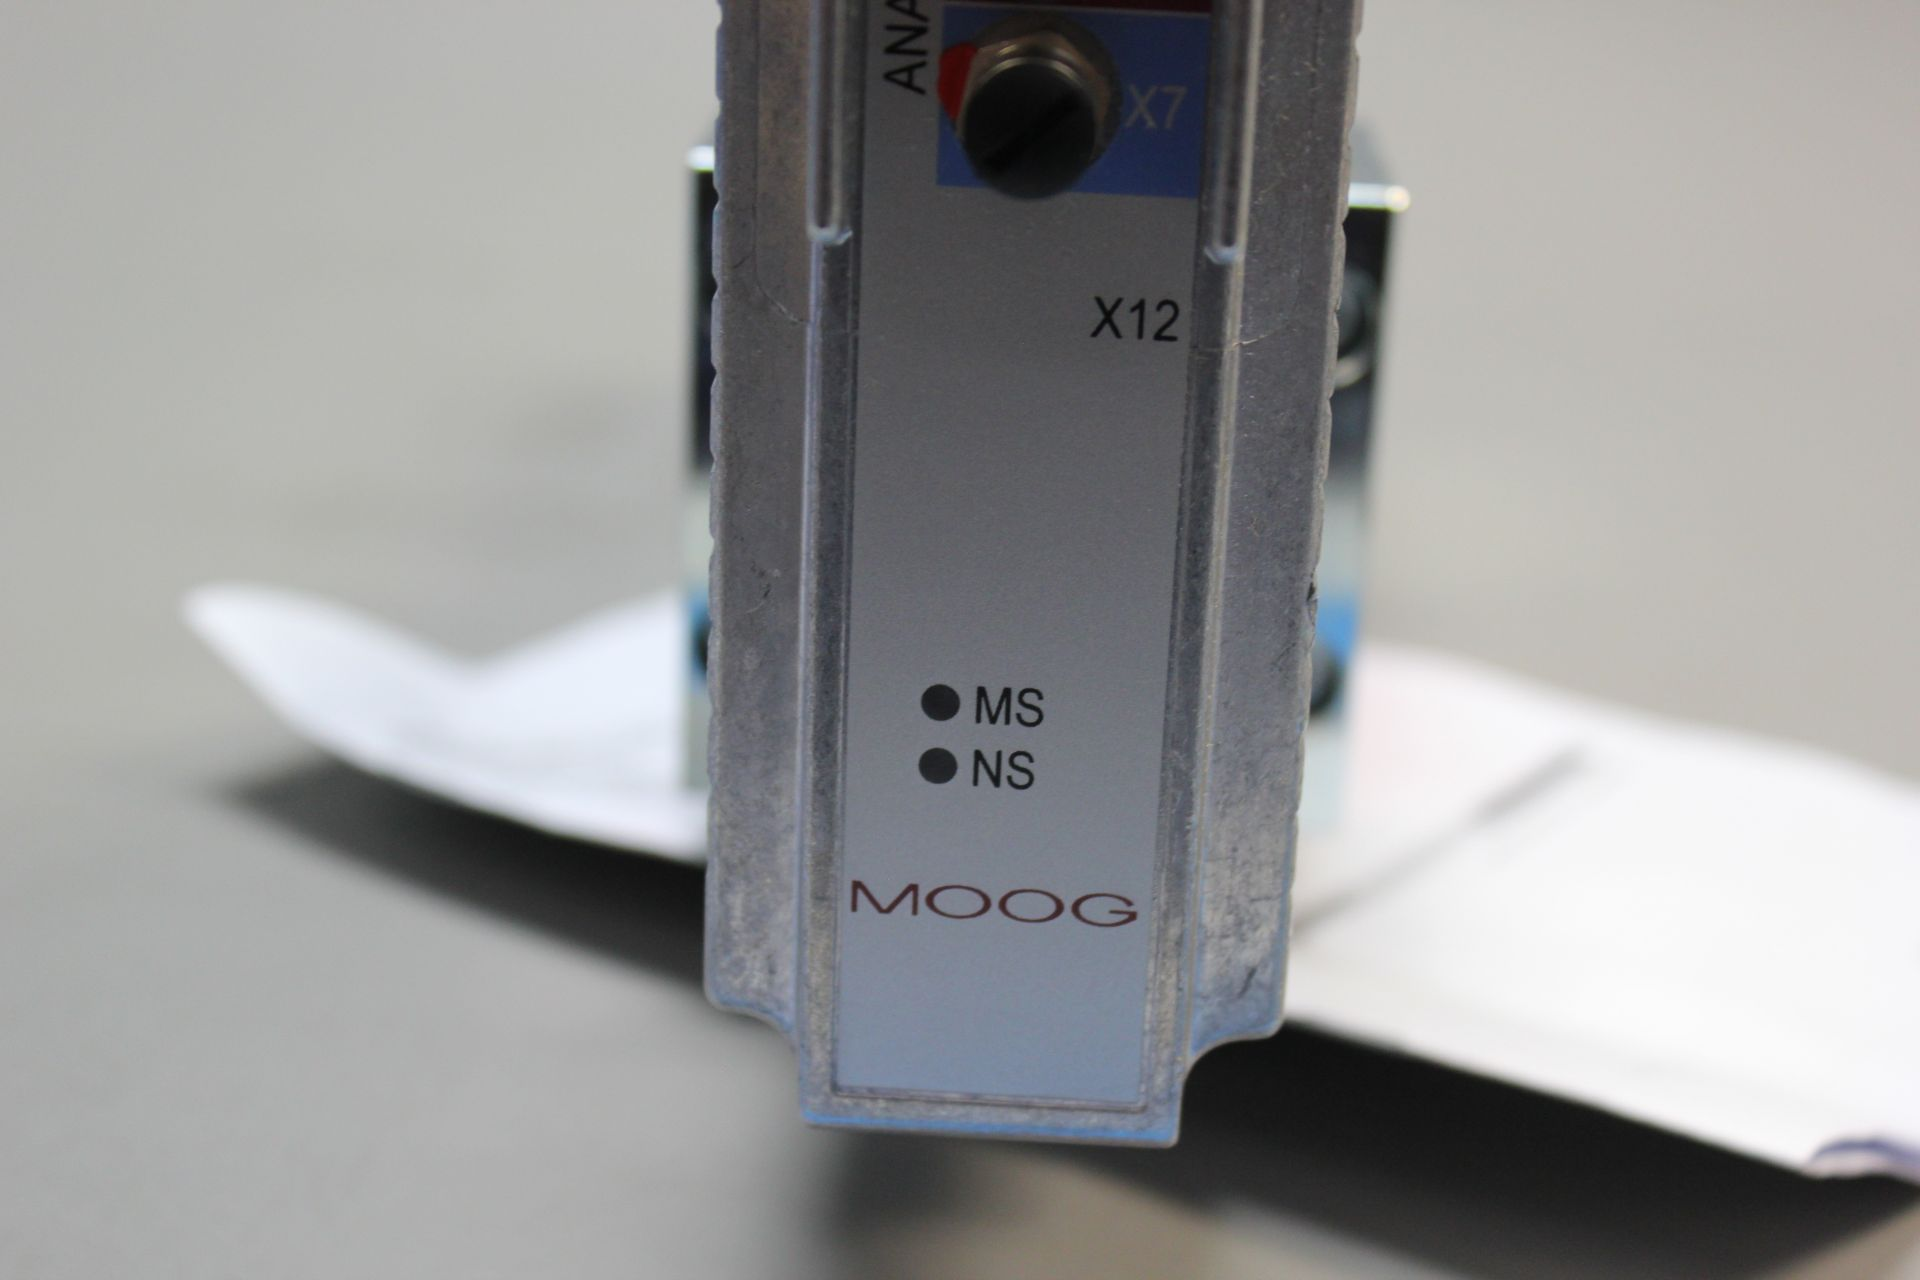 NEW MOOG DIRECT DRIVE DIGITAL CONTROL HYDRAULIC SERVO VALVE - Image 11 of 14